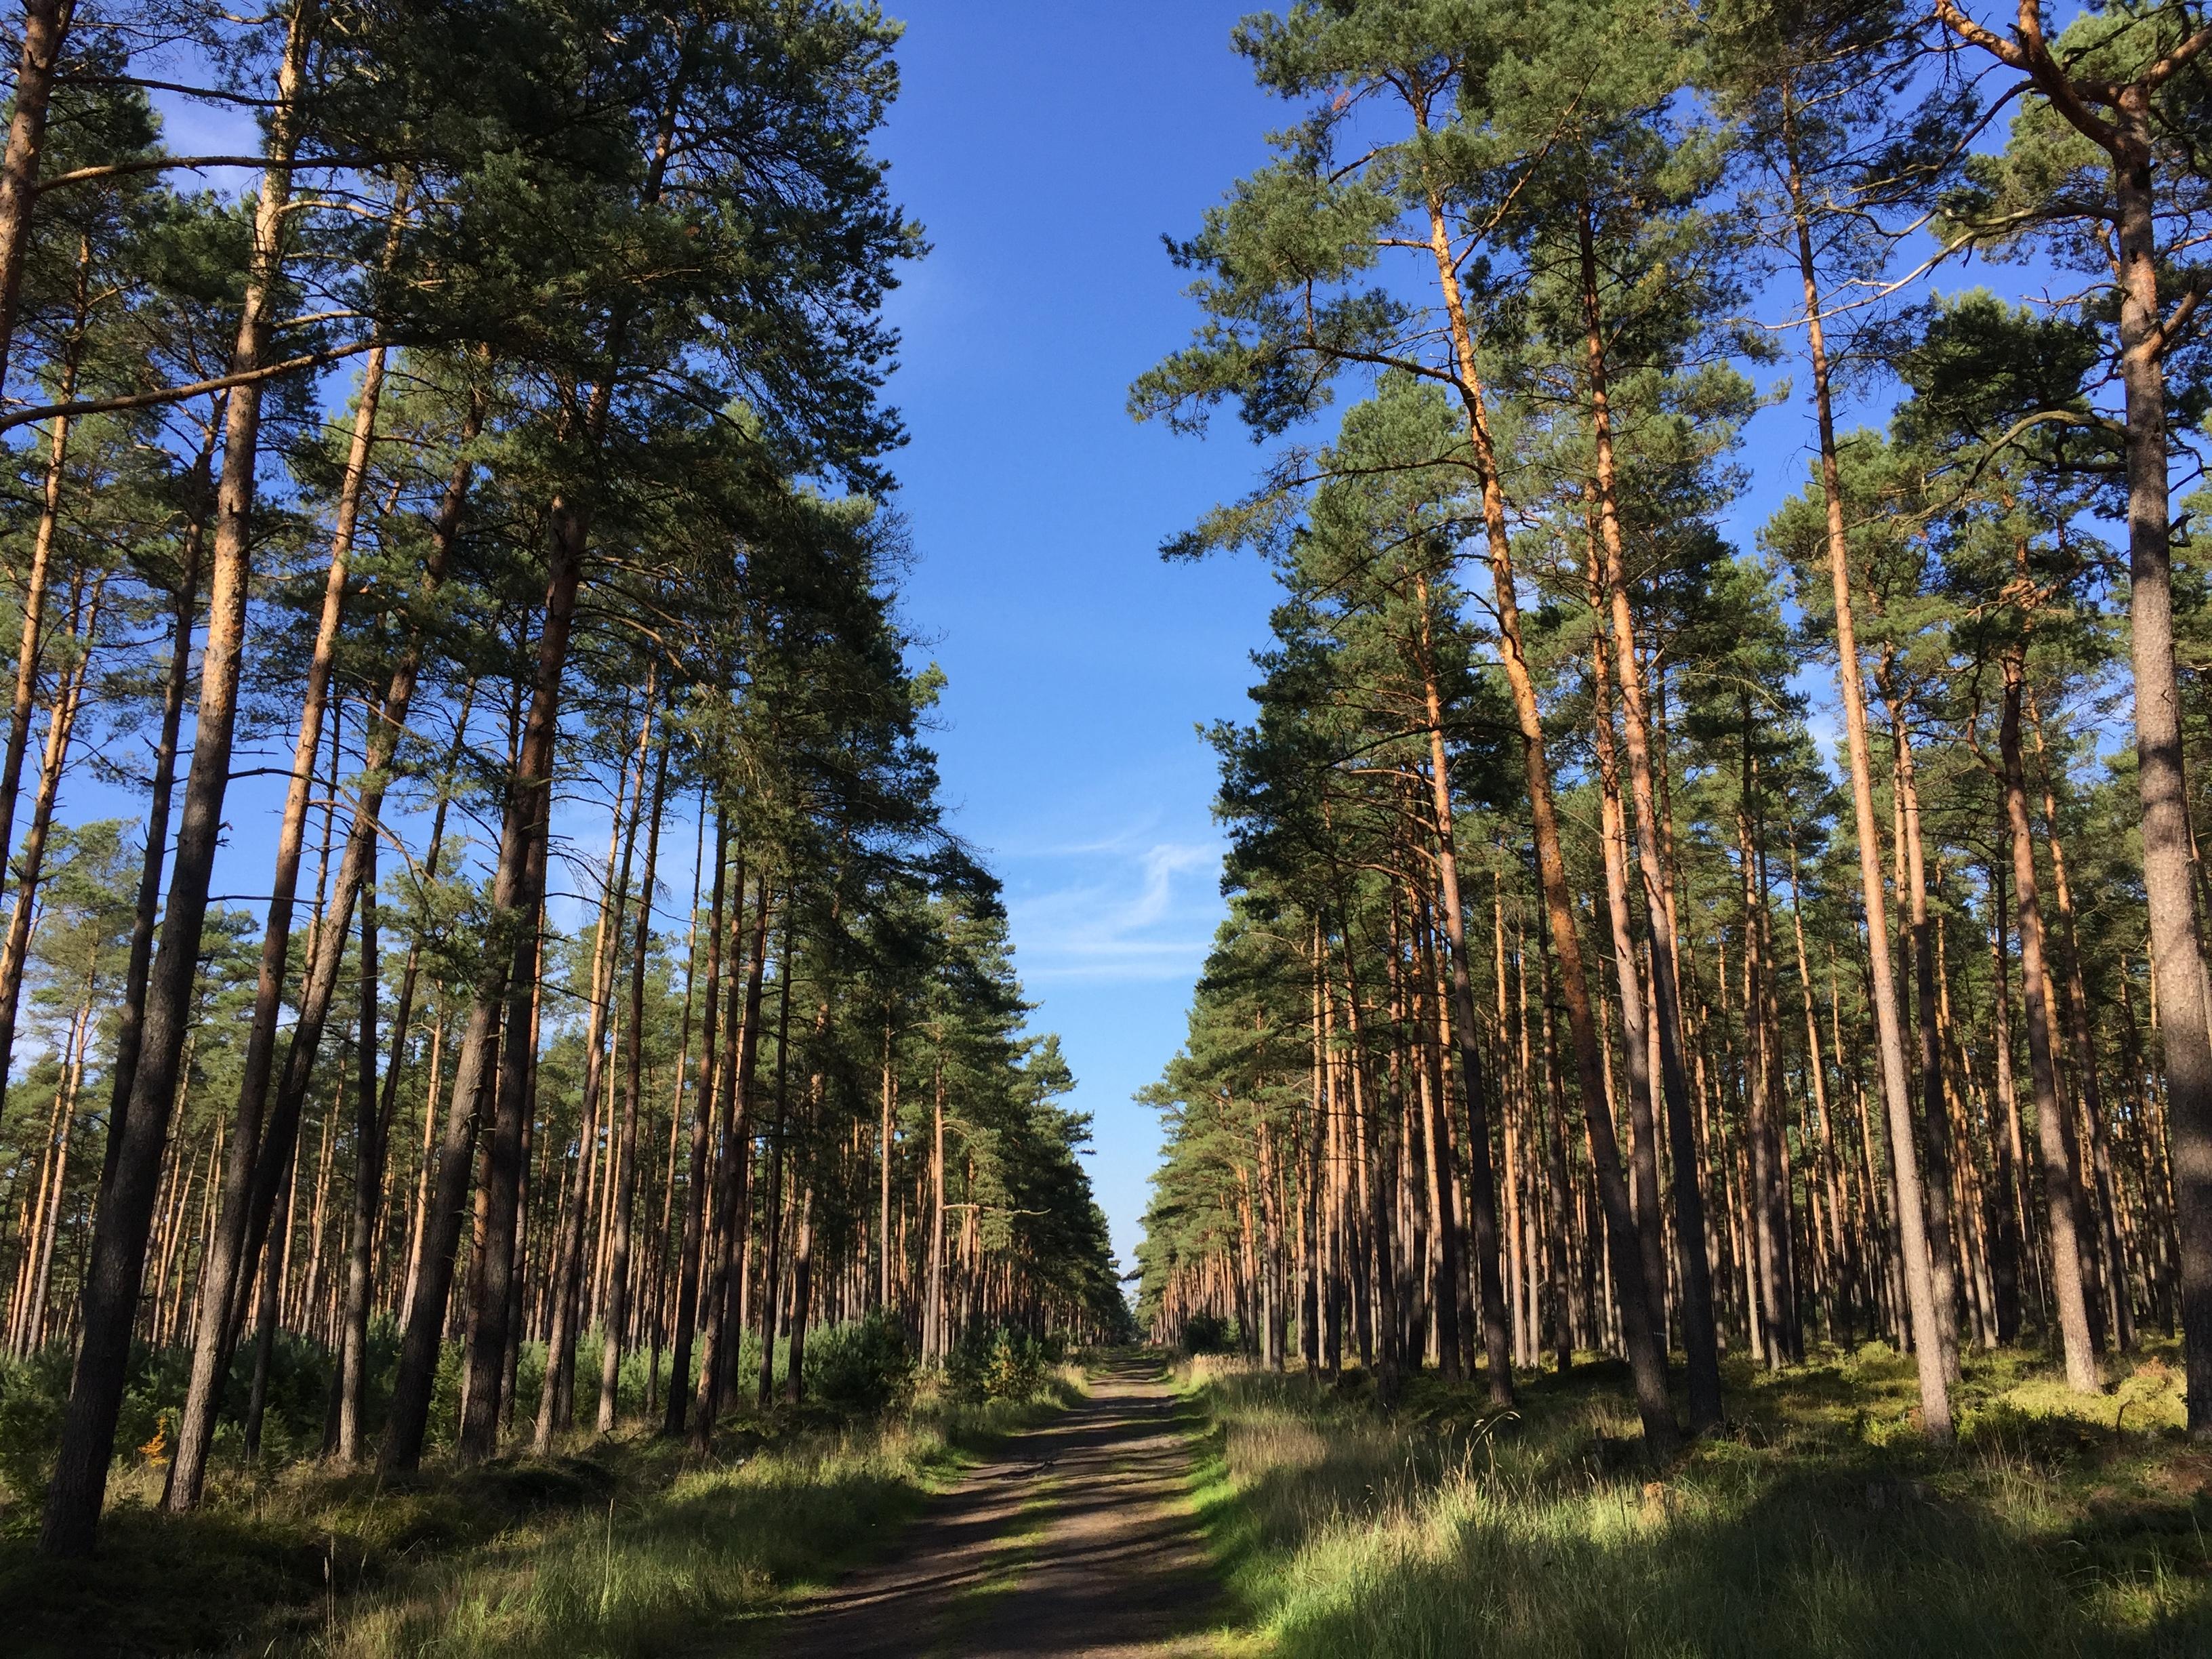 Crossing Forst Rundshorn to Contidrom/Jeversen